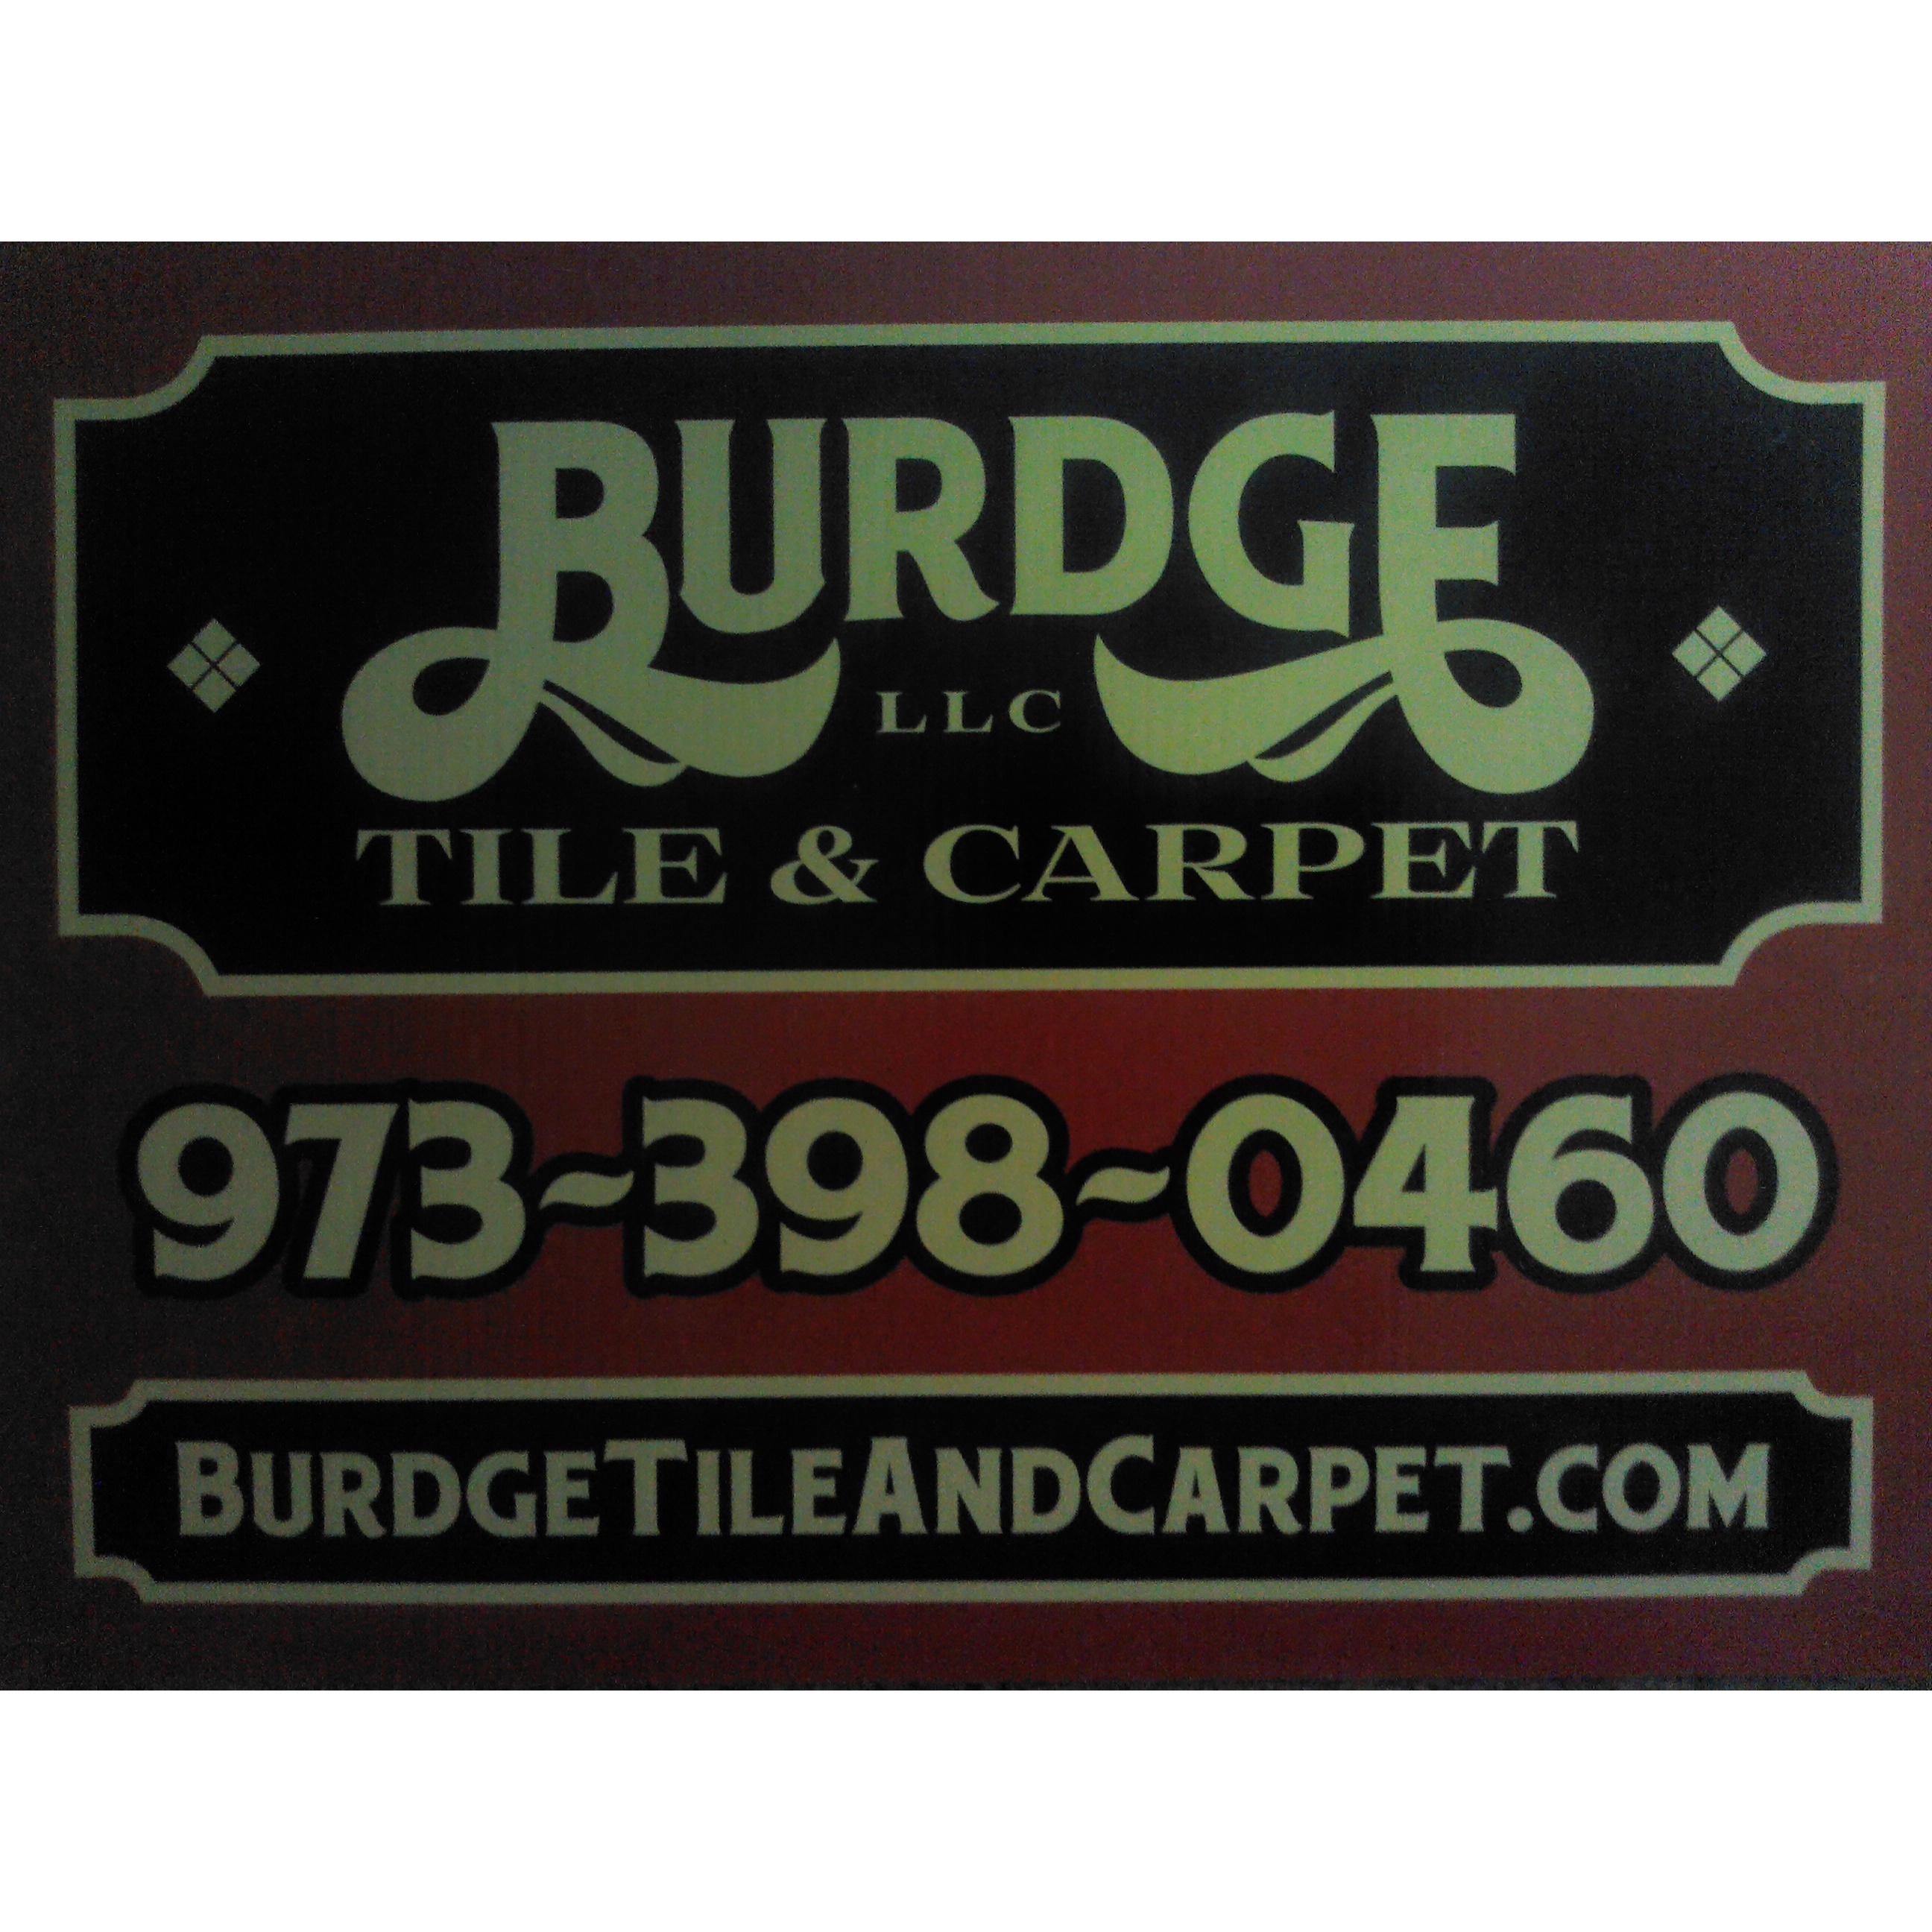 Burdge Tile & Carpet LLC image 0